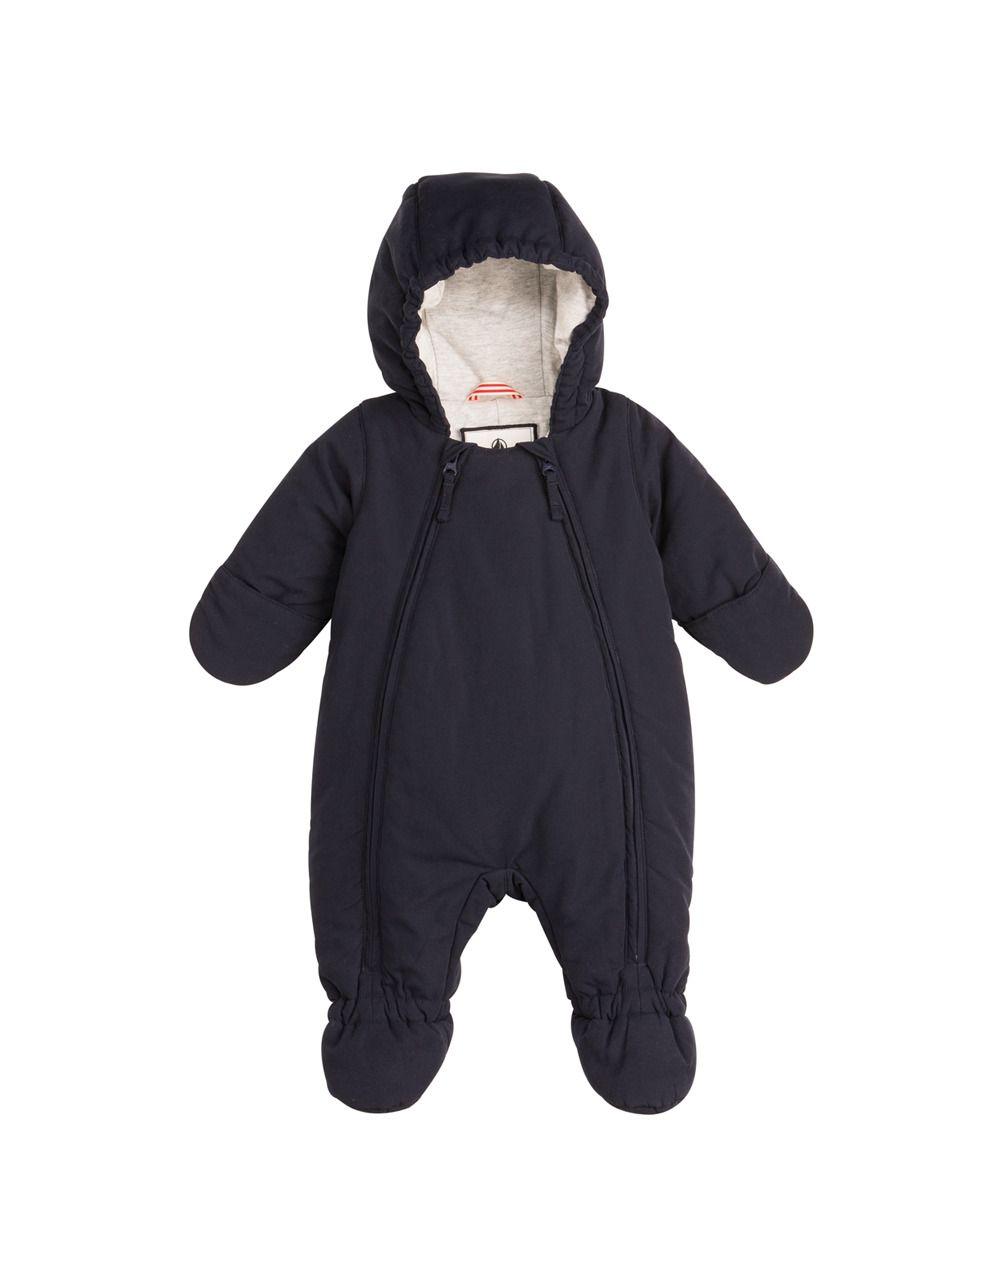 78f1f342e381 Buzo de bebé niño Petit Bateau - Niño - Prendas de abrigo - El Corte ...